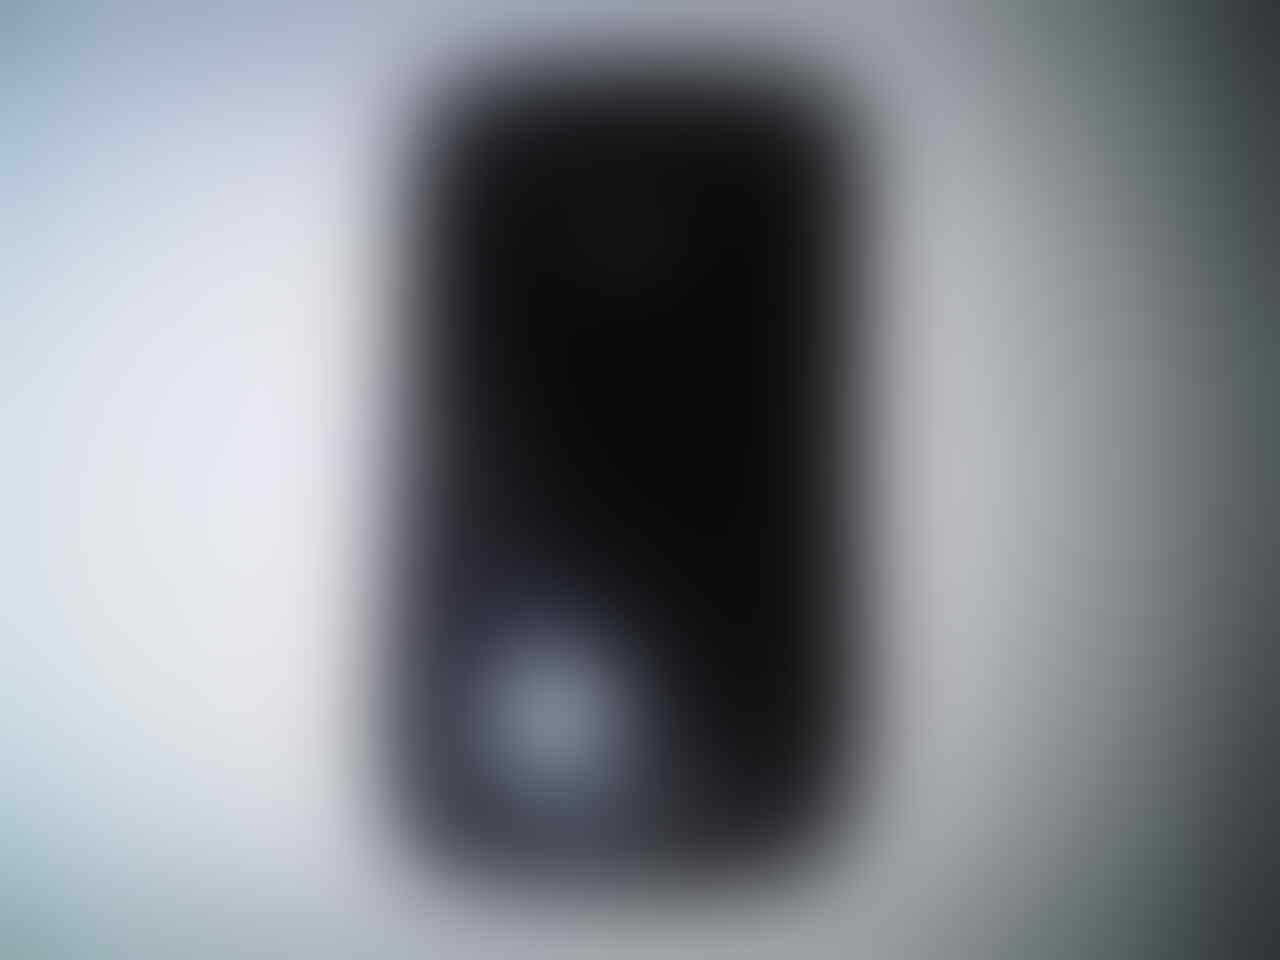 BLACKBERRY 8520 GEMINI BLACK MALANG